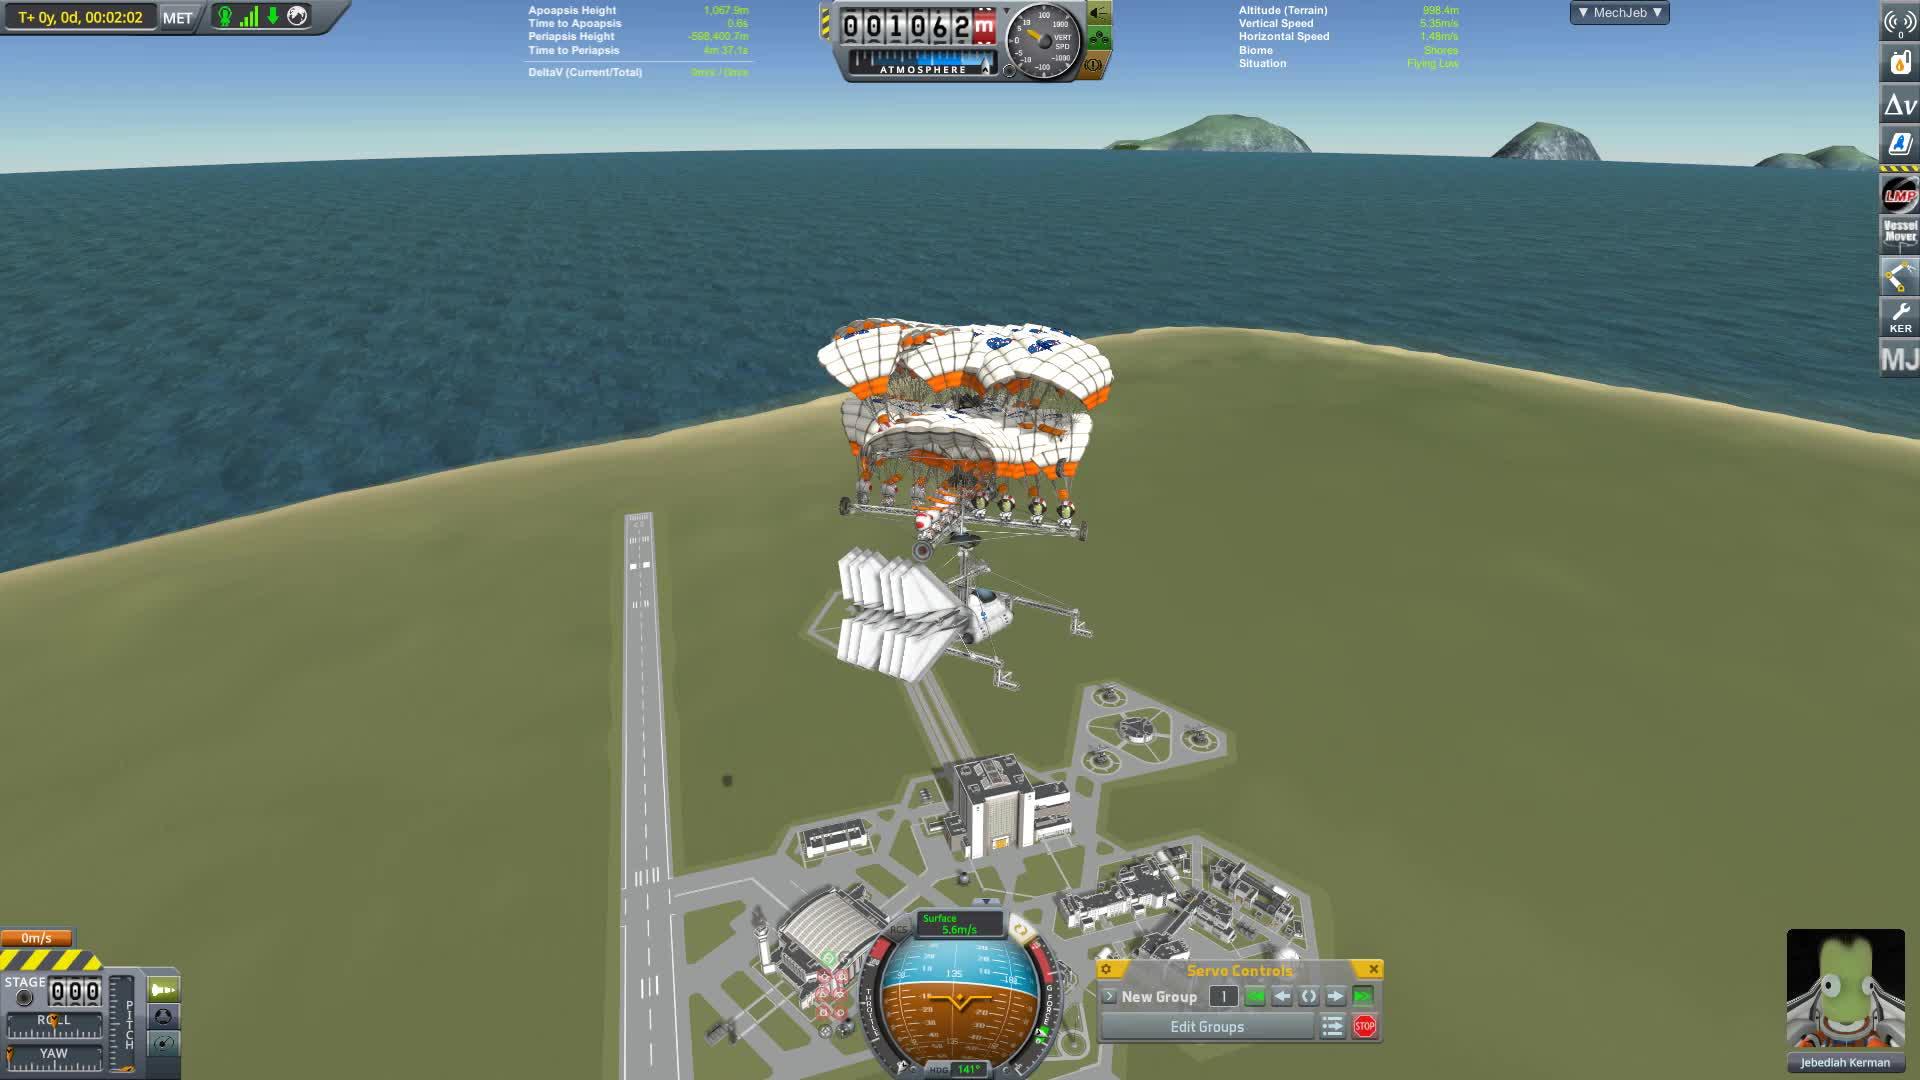 chutacopter, helicopter, jatwaa, kerbal space program, mod, modded, mods, ChutaCopter v2 GIFs